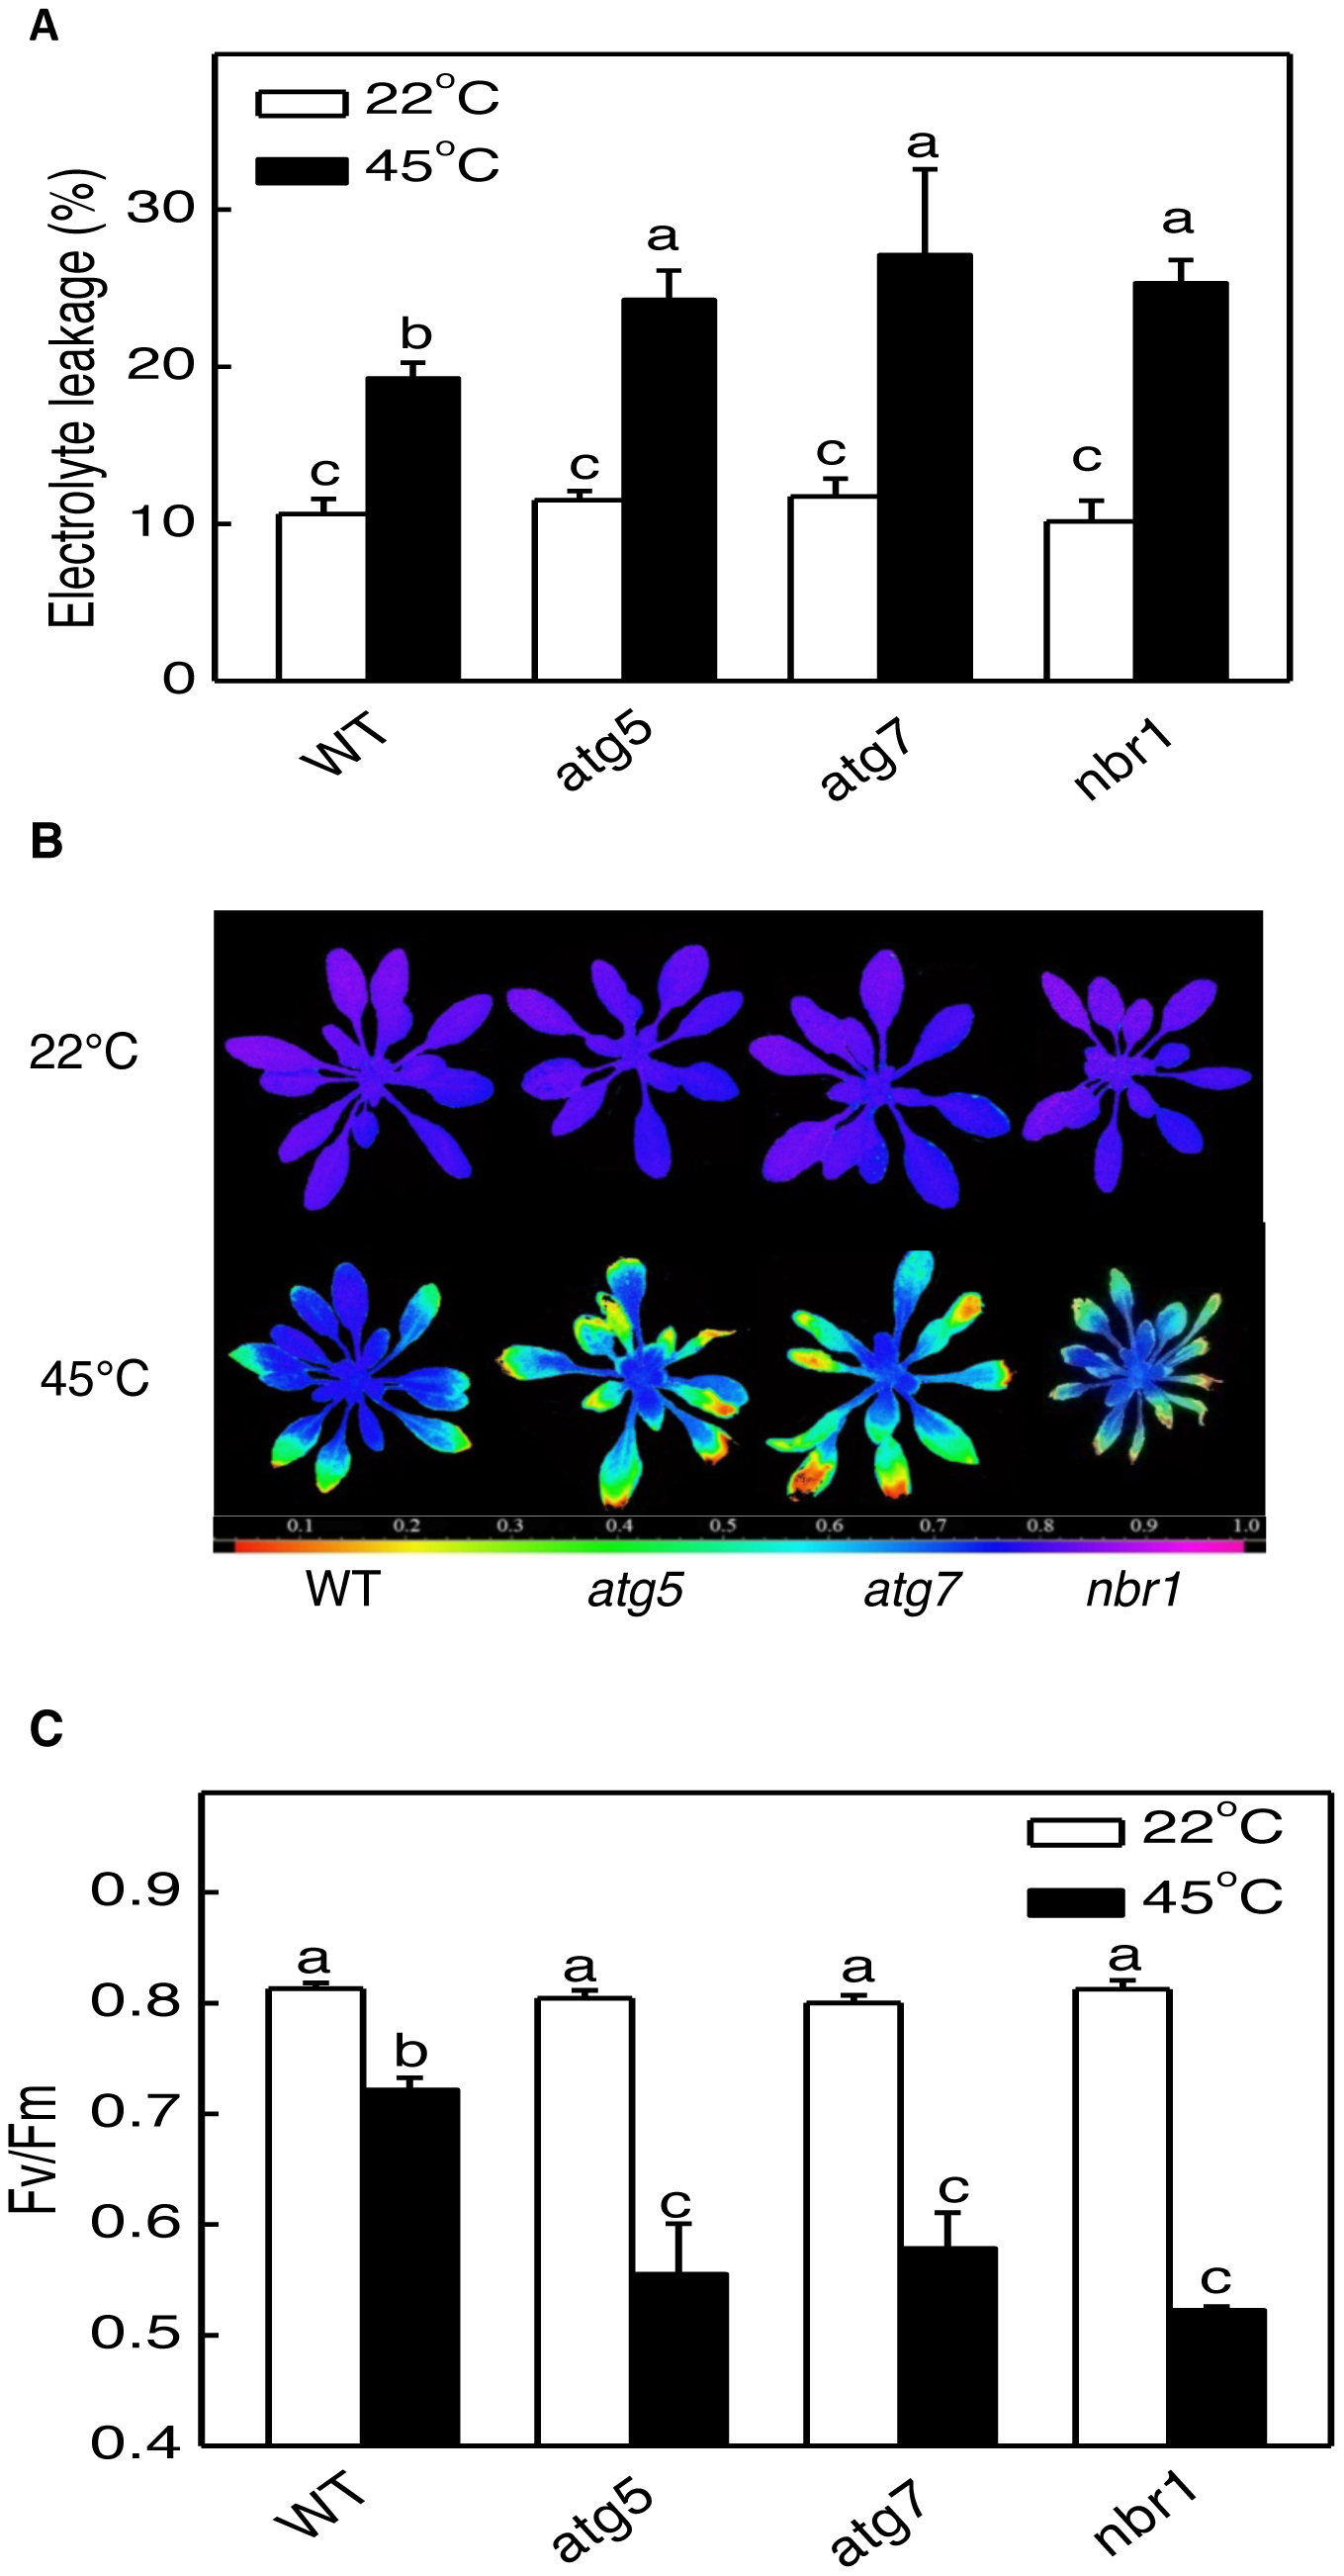 Enhanced sensitivity of <i>atg5</i>, <i>atg7</i>, and <i>nbr1</i> mutants to heat stress.